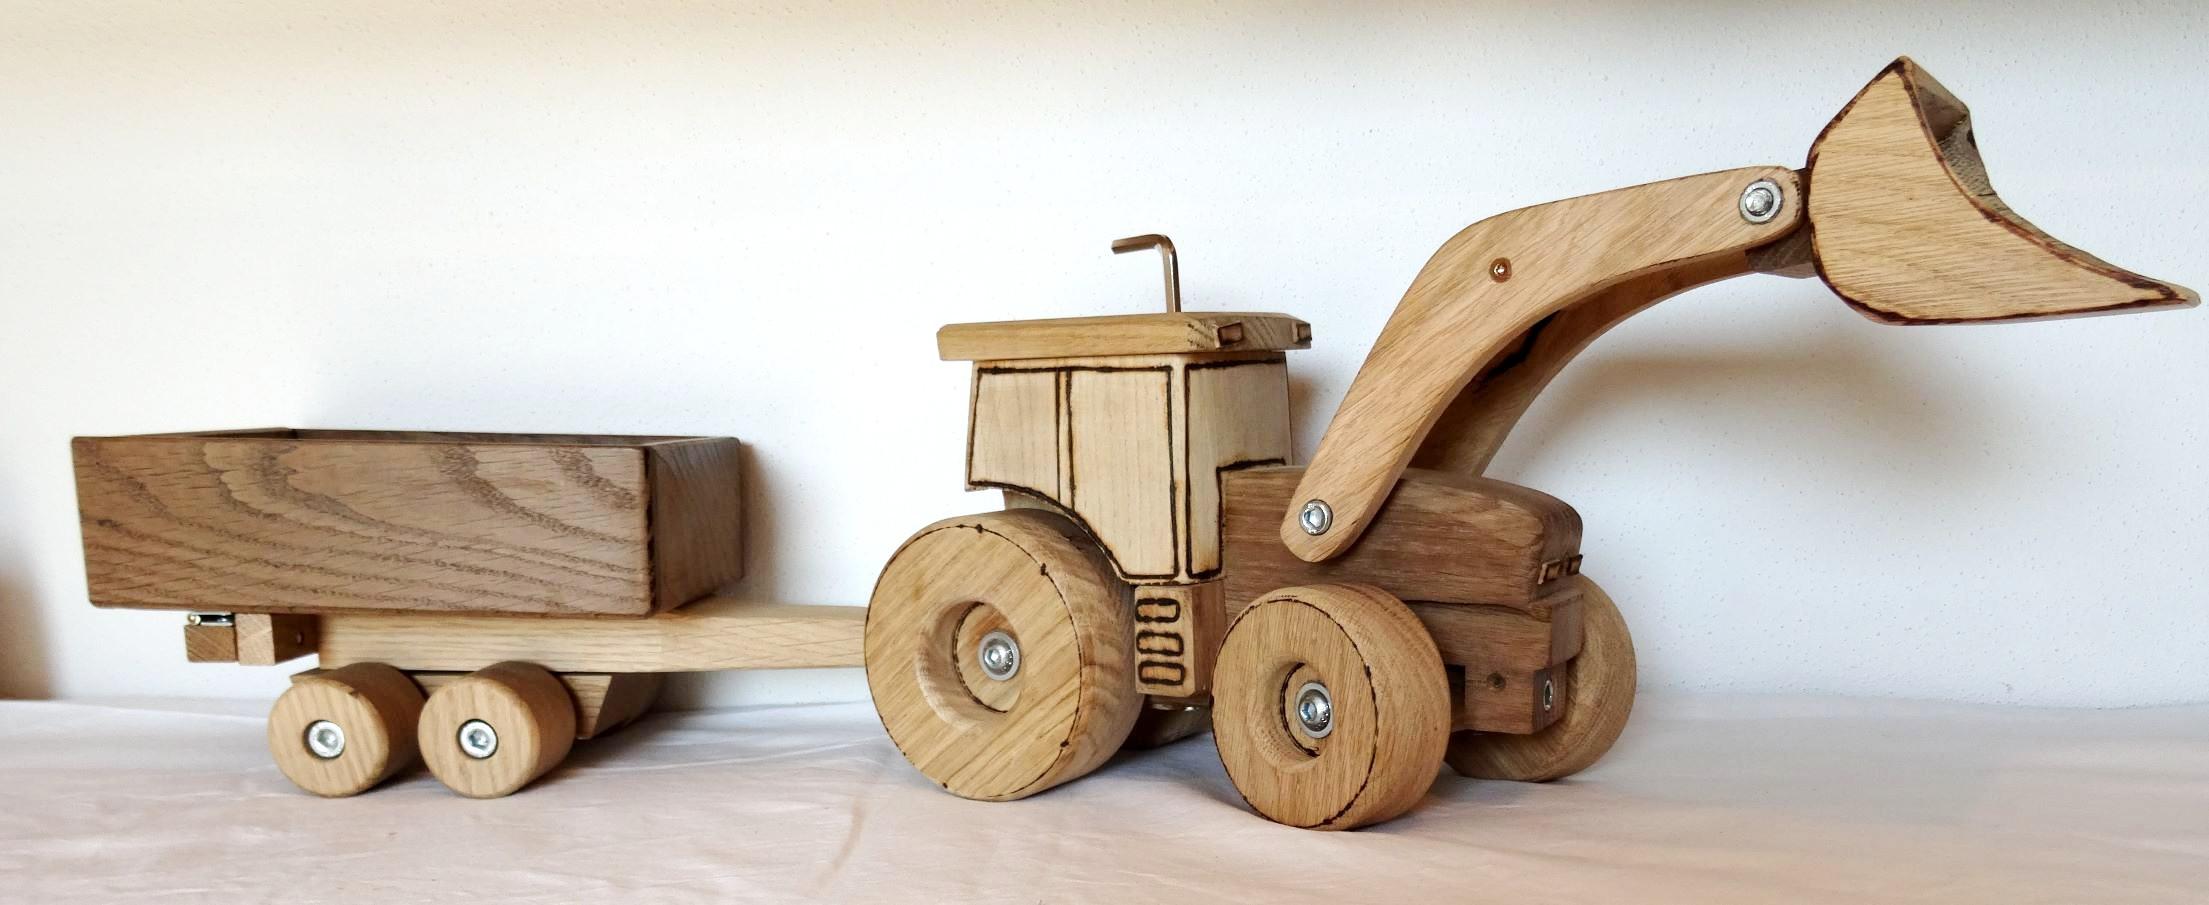 Traktor1_edited.jpg